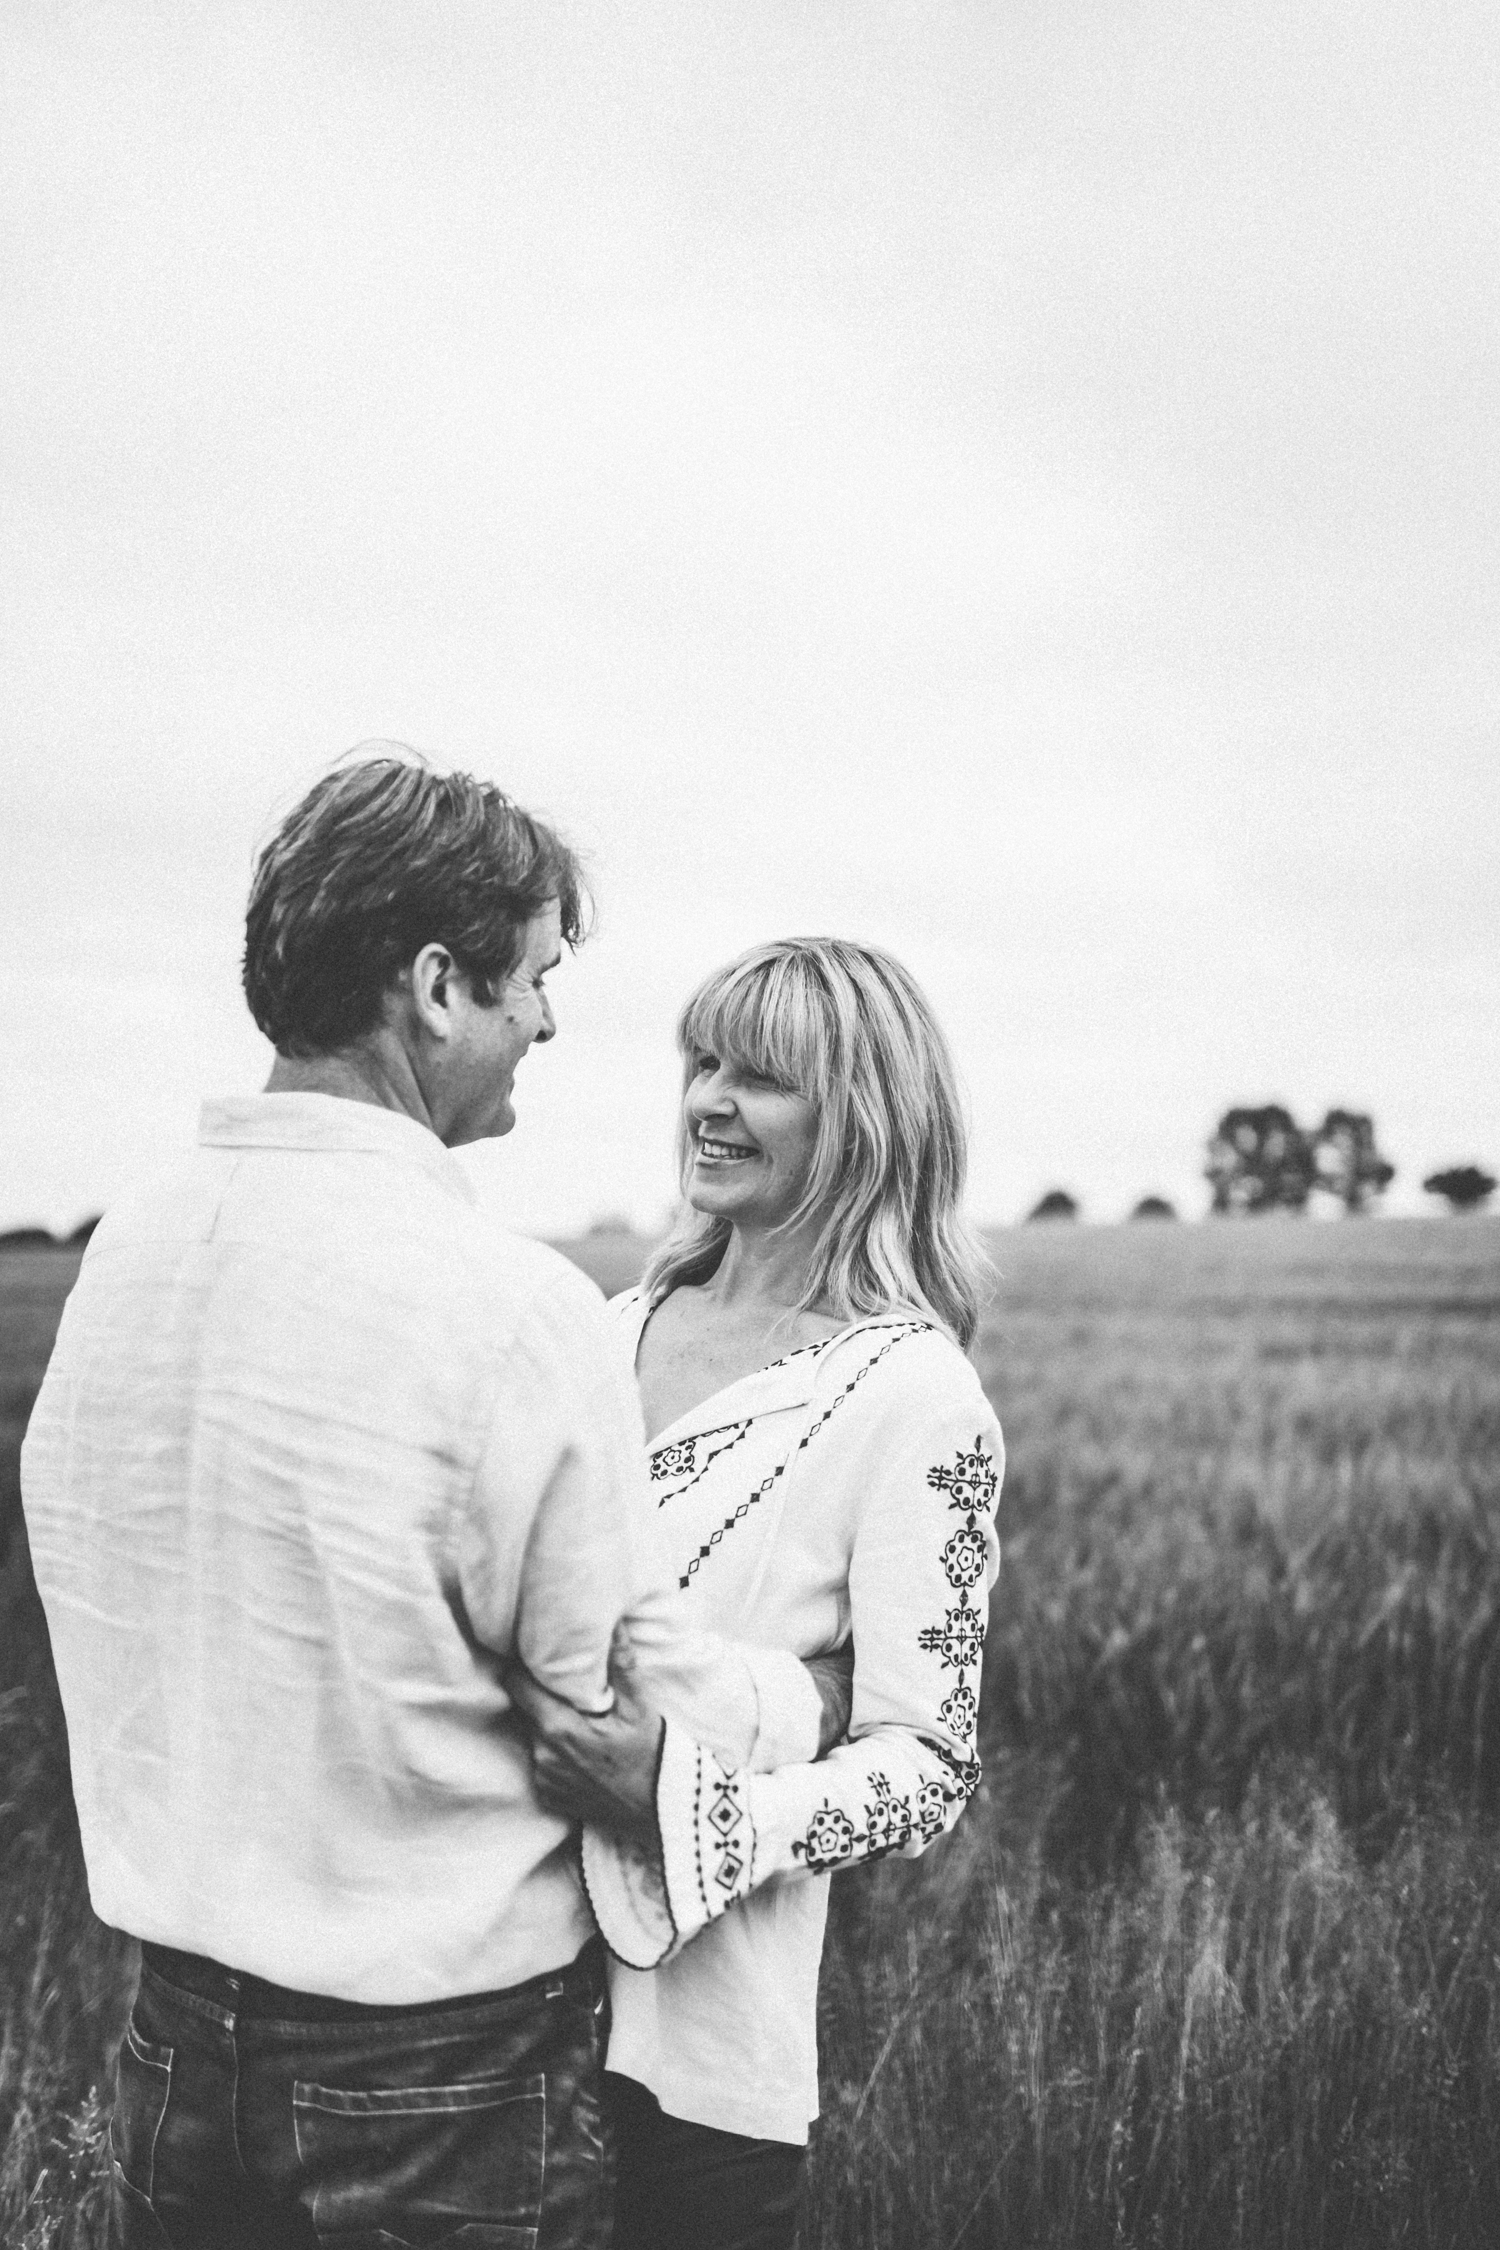 Engagement-Shoot-Session-Norfolk-Devon-Photography-Photographer-Dartmouth-Southhams-51.jpg